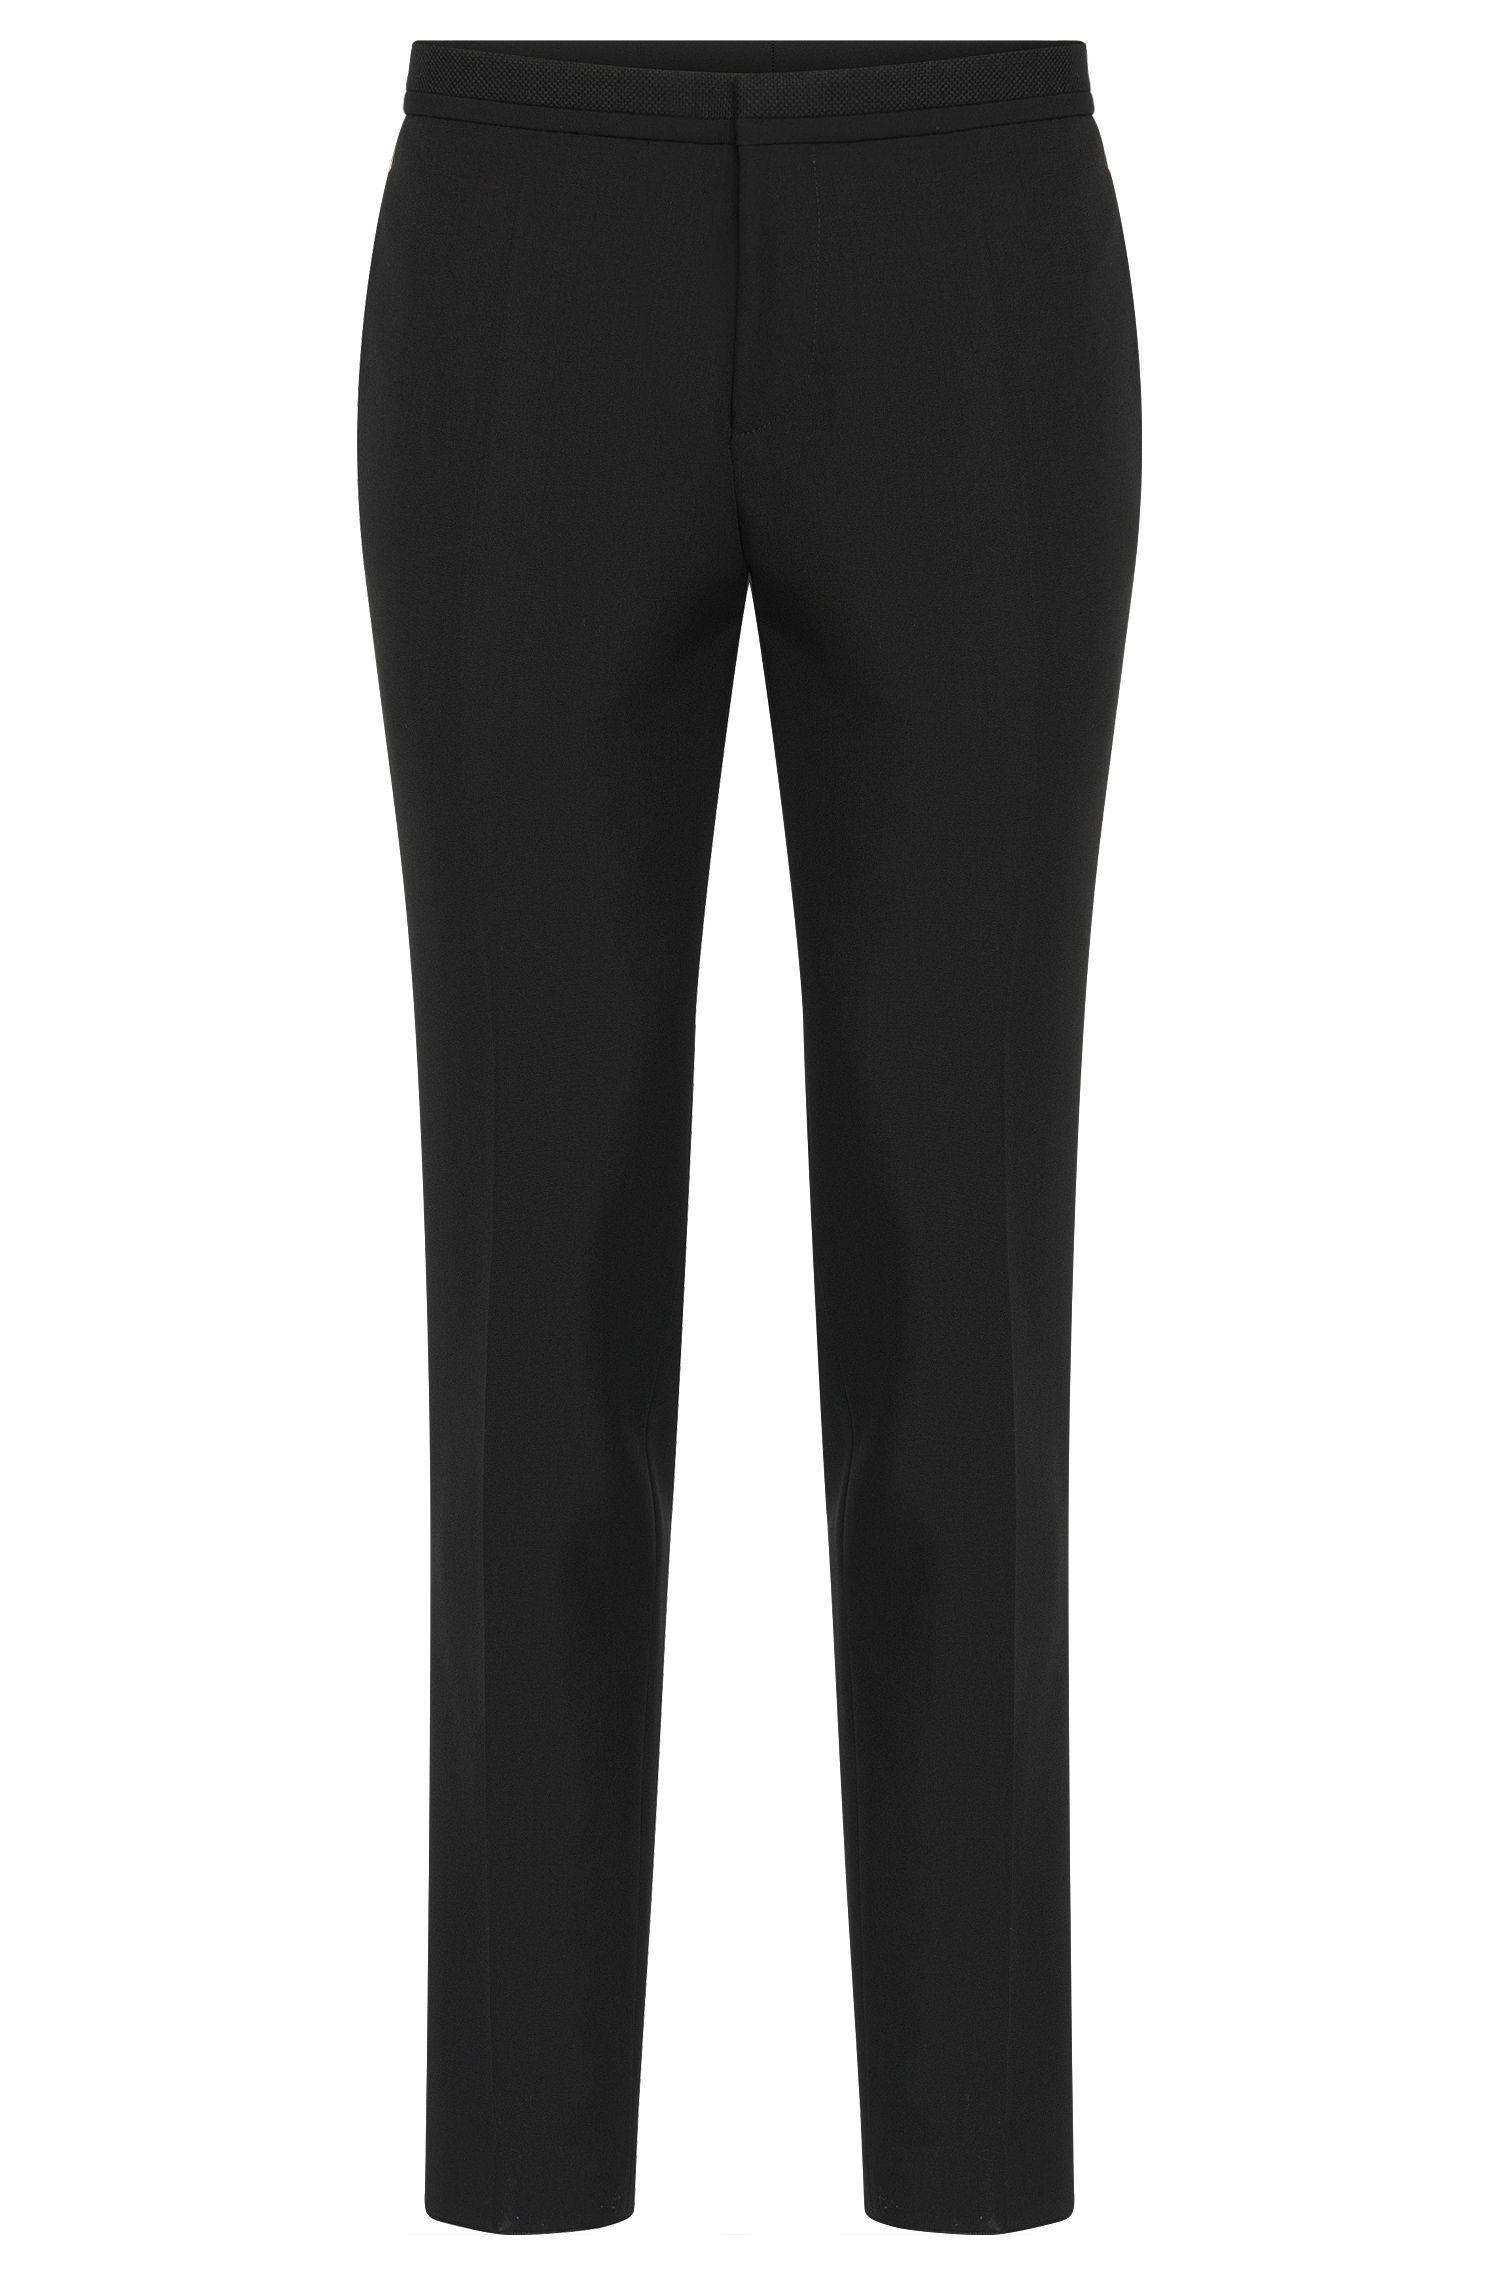 Virgin Wool Mohair Dress Pants, Extra Slim Fit | Wynn